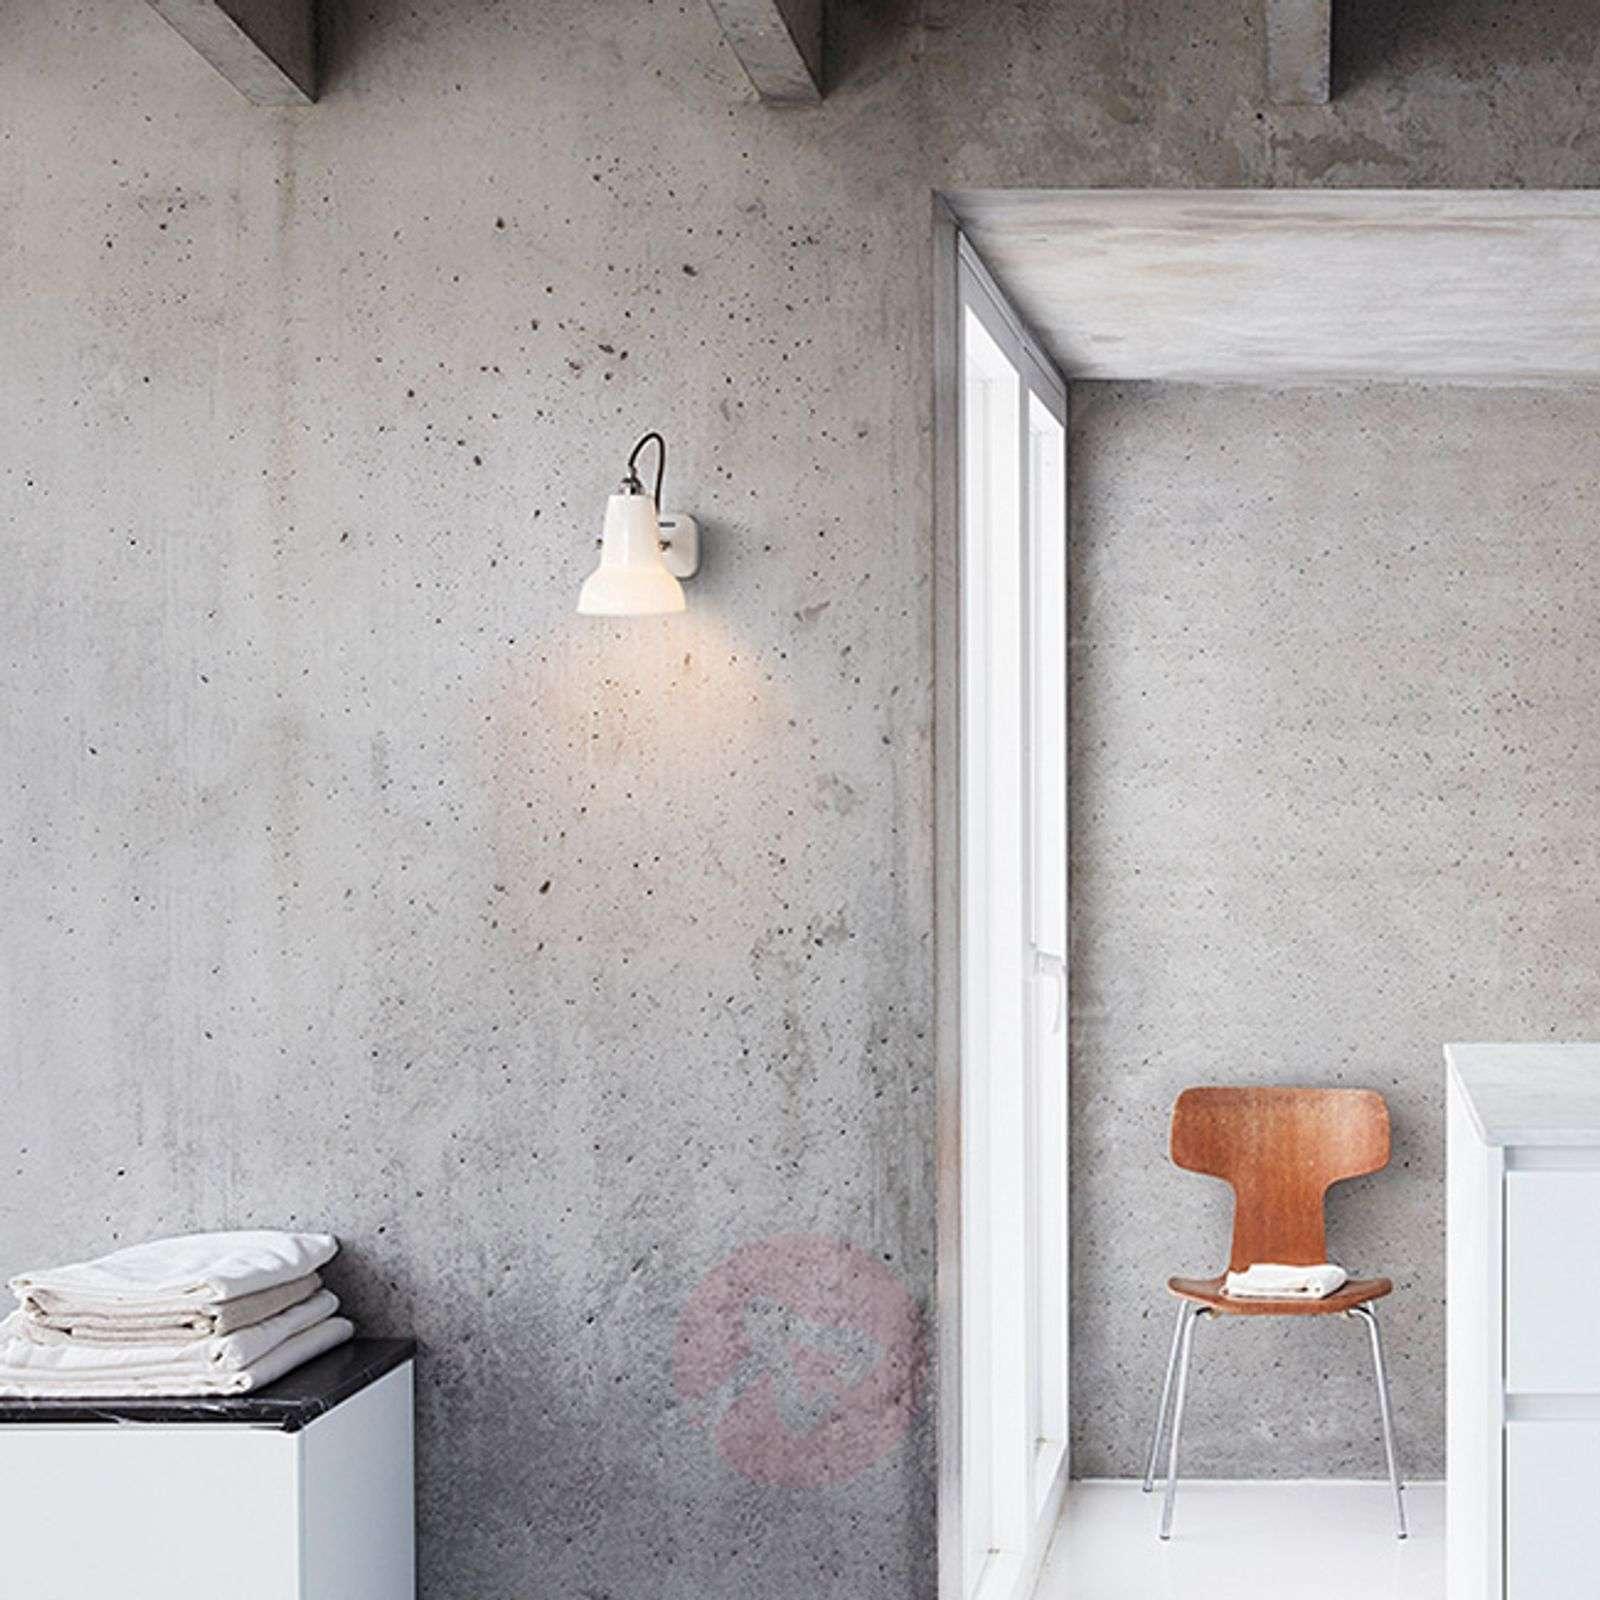 Anglepoise Original 1227 Mini ceramic wall light-1073092-01